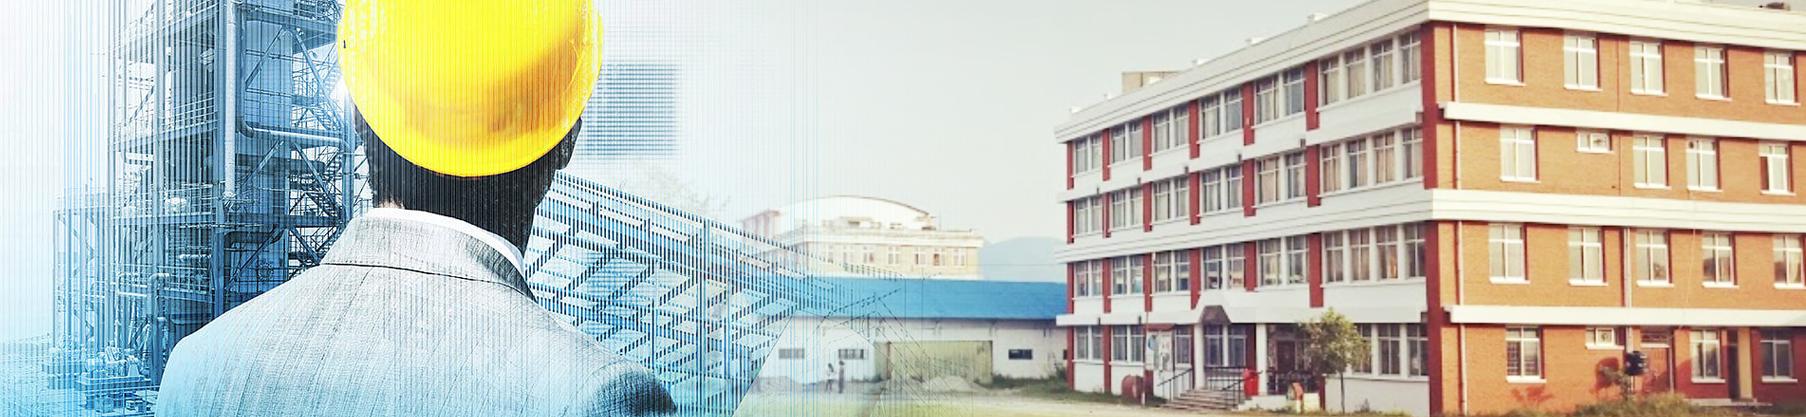 Pokhara University School of Engineering